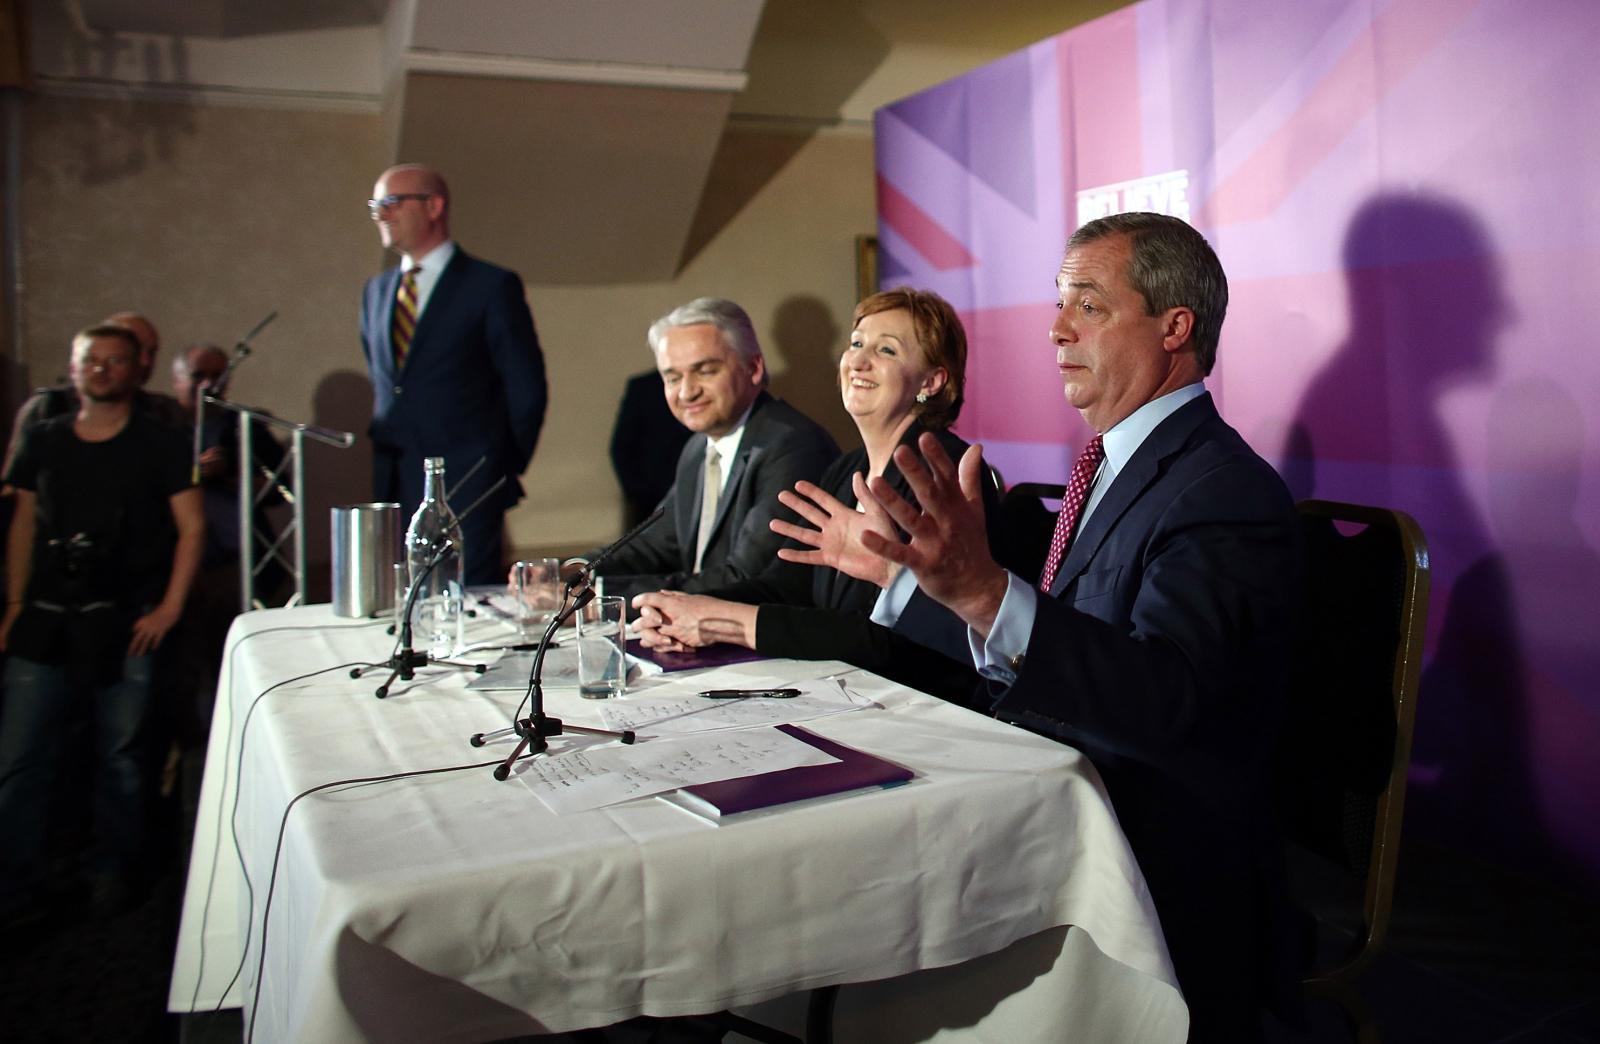 Nigel Farage and Ukip team